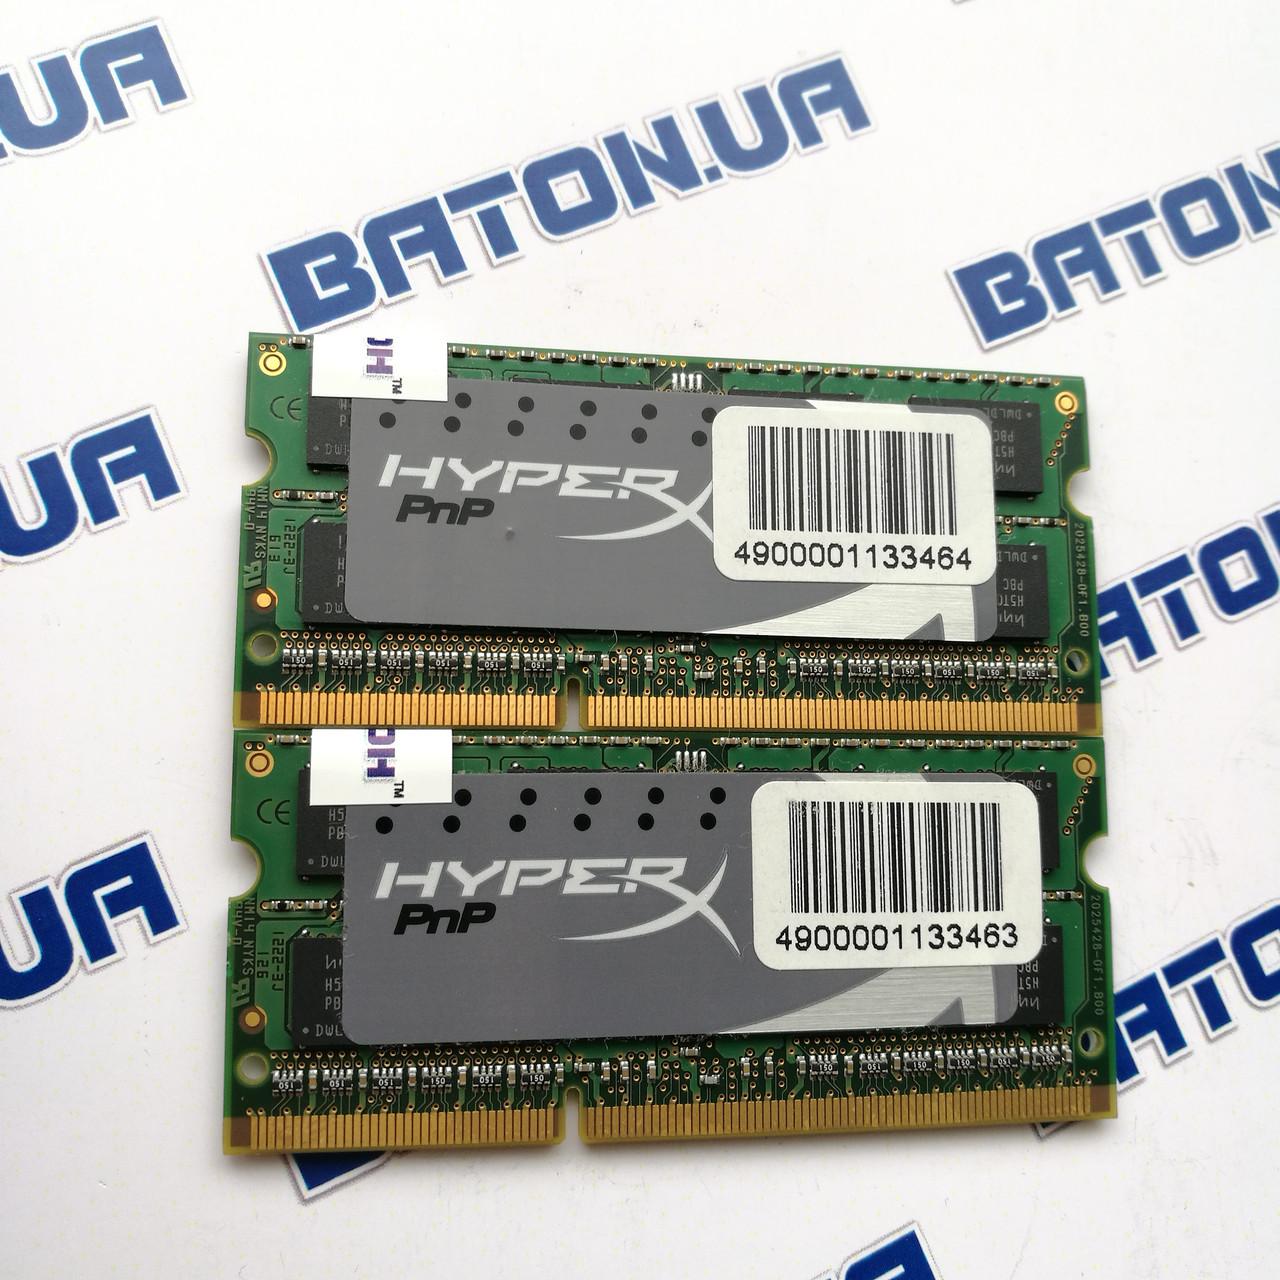 Оперативная память для ноутбука Kingston SODIMM DDR3 8Gb 1600MHz 12800s CL9 (KHX1600C9S3P1K2/8G)